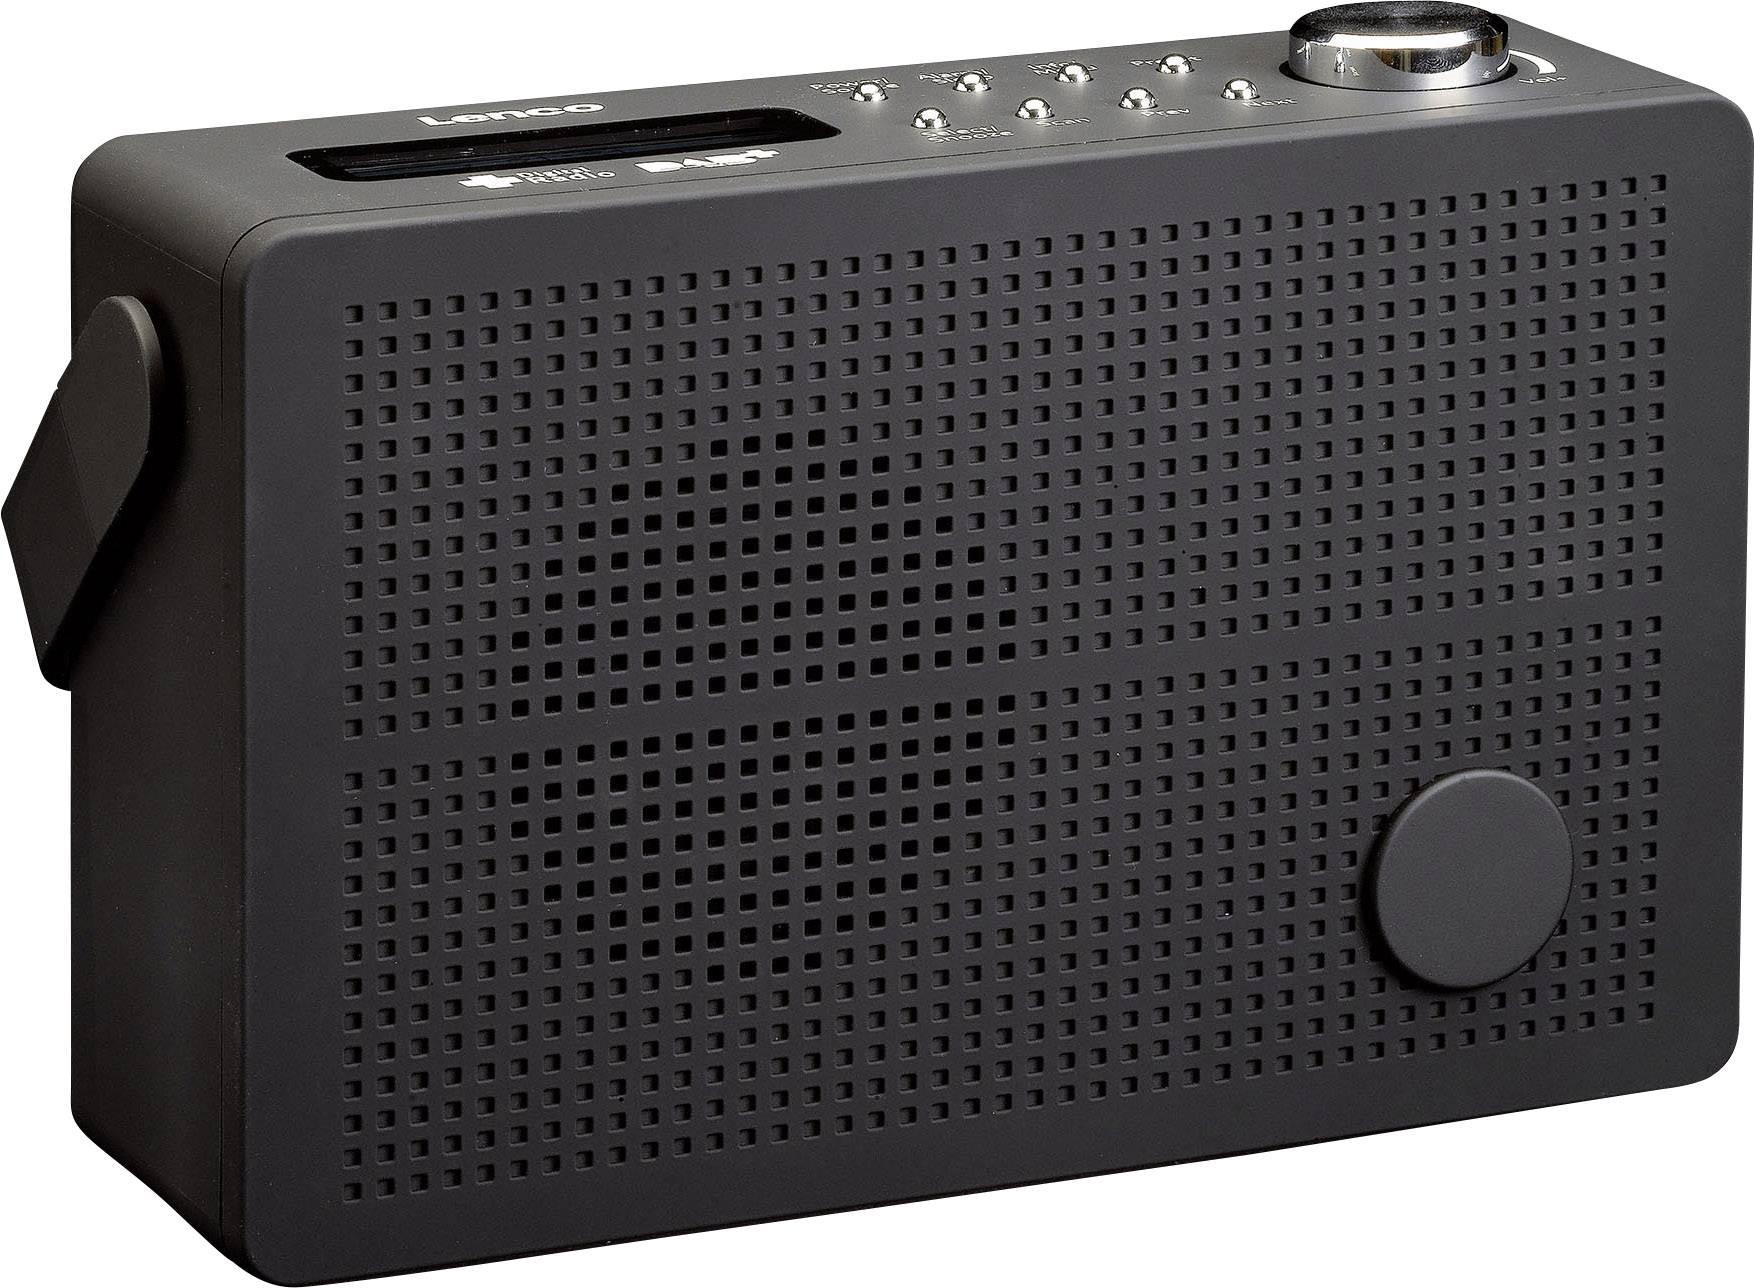 DAB+ stolné rádio Lenco PDR-030, UKW, DAB+, čierna